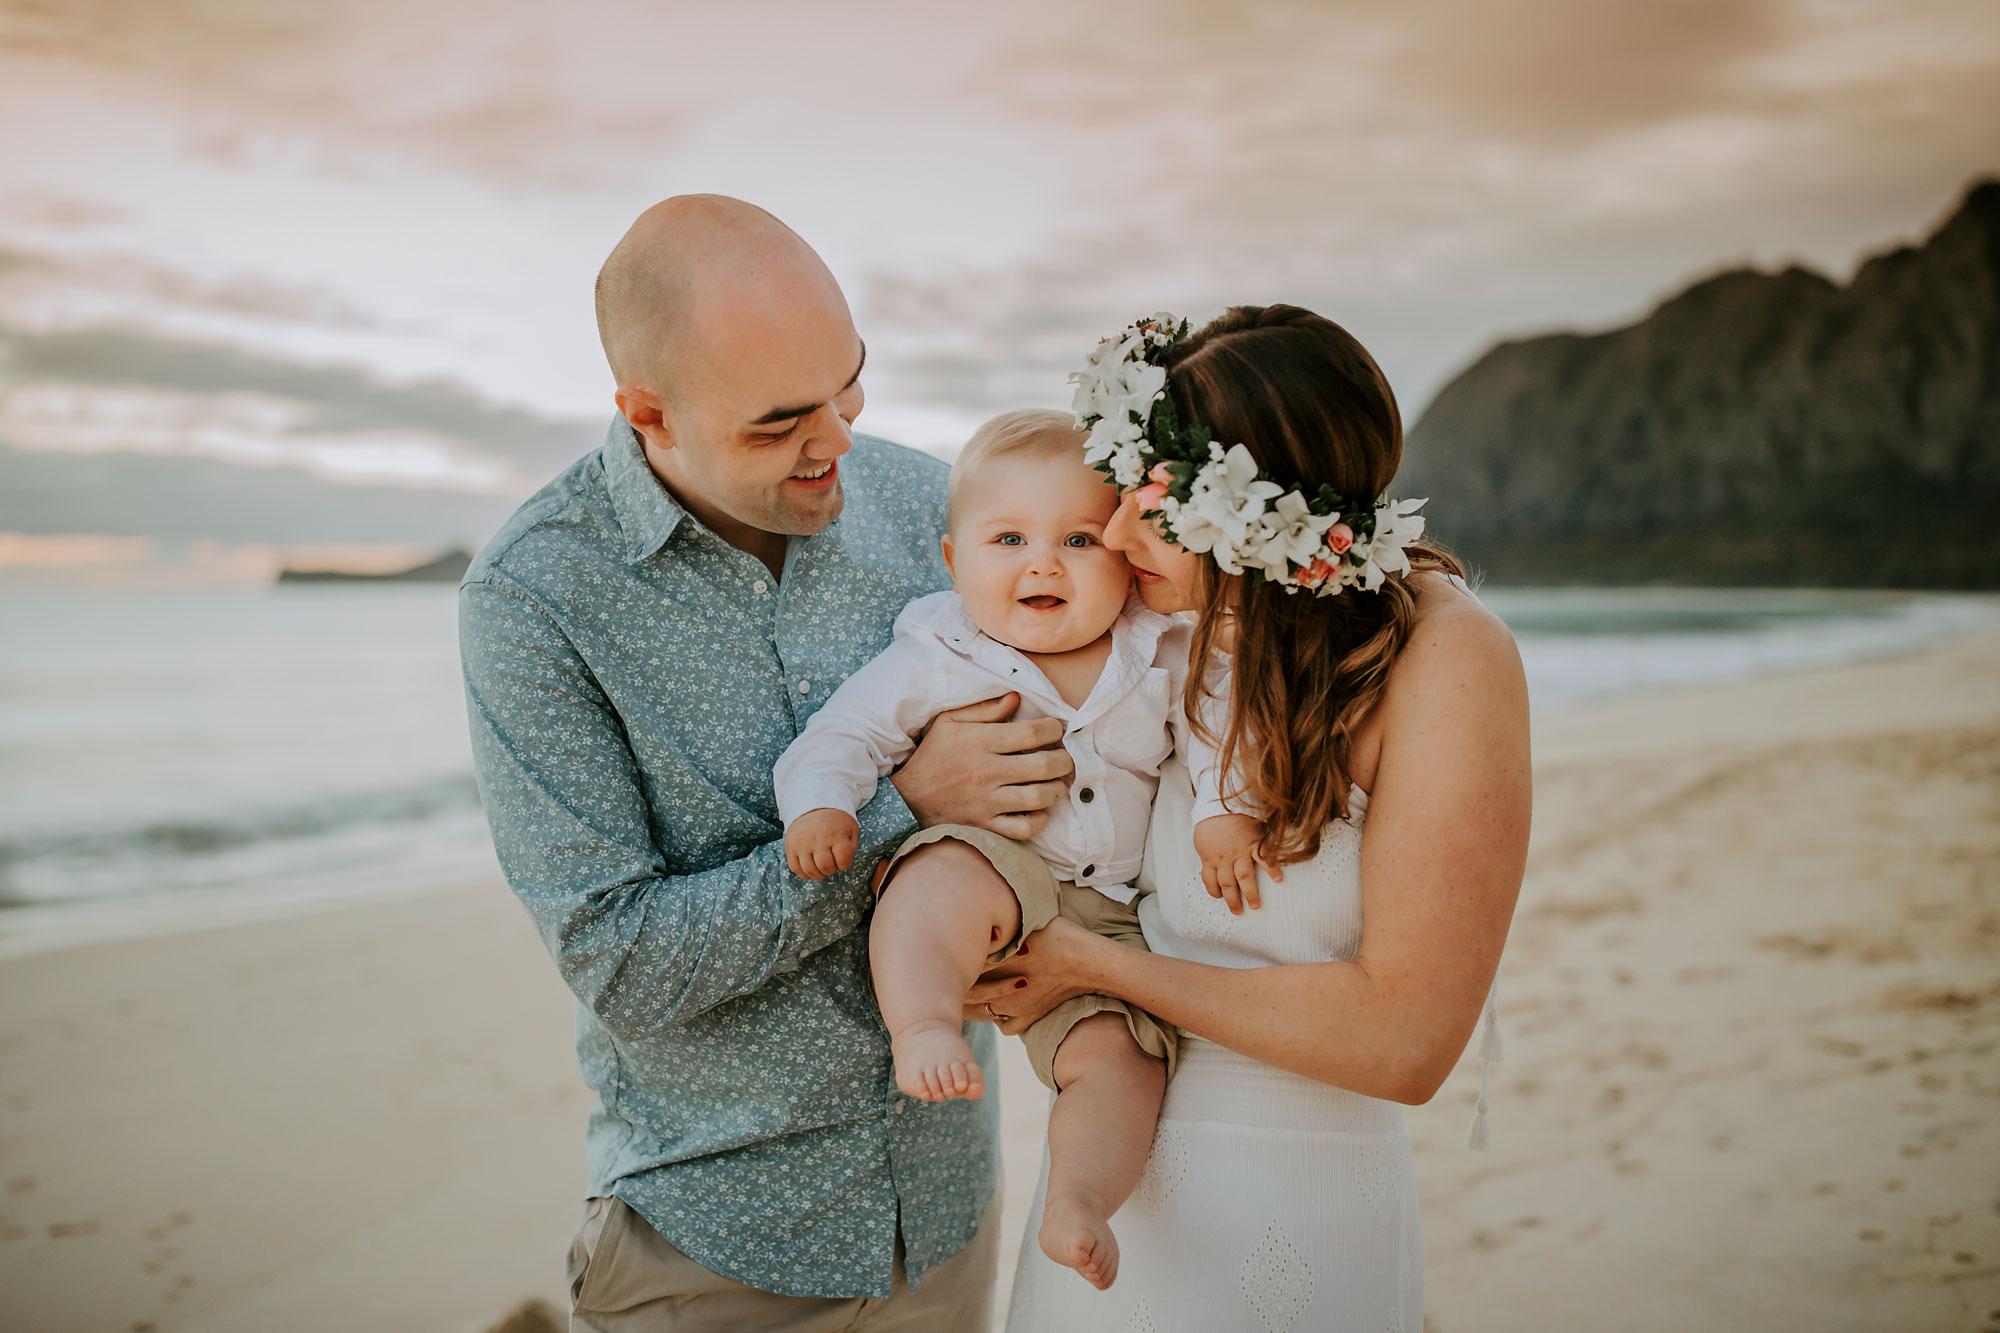 Hawaii-Oahu-Family-Photographer-03.jpg